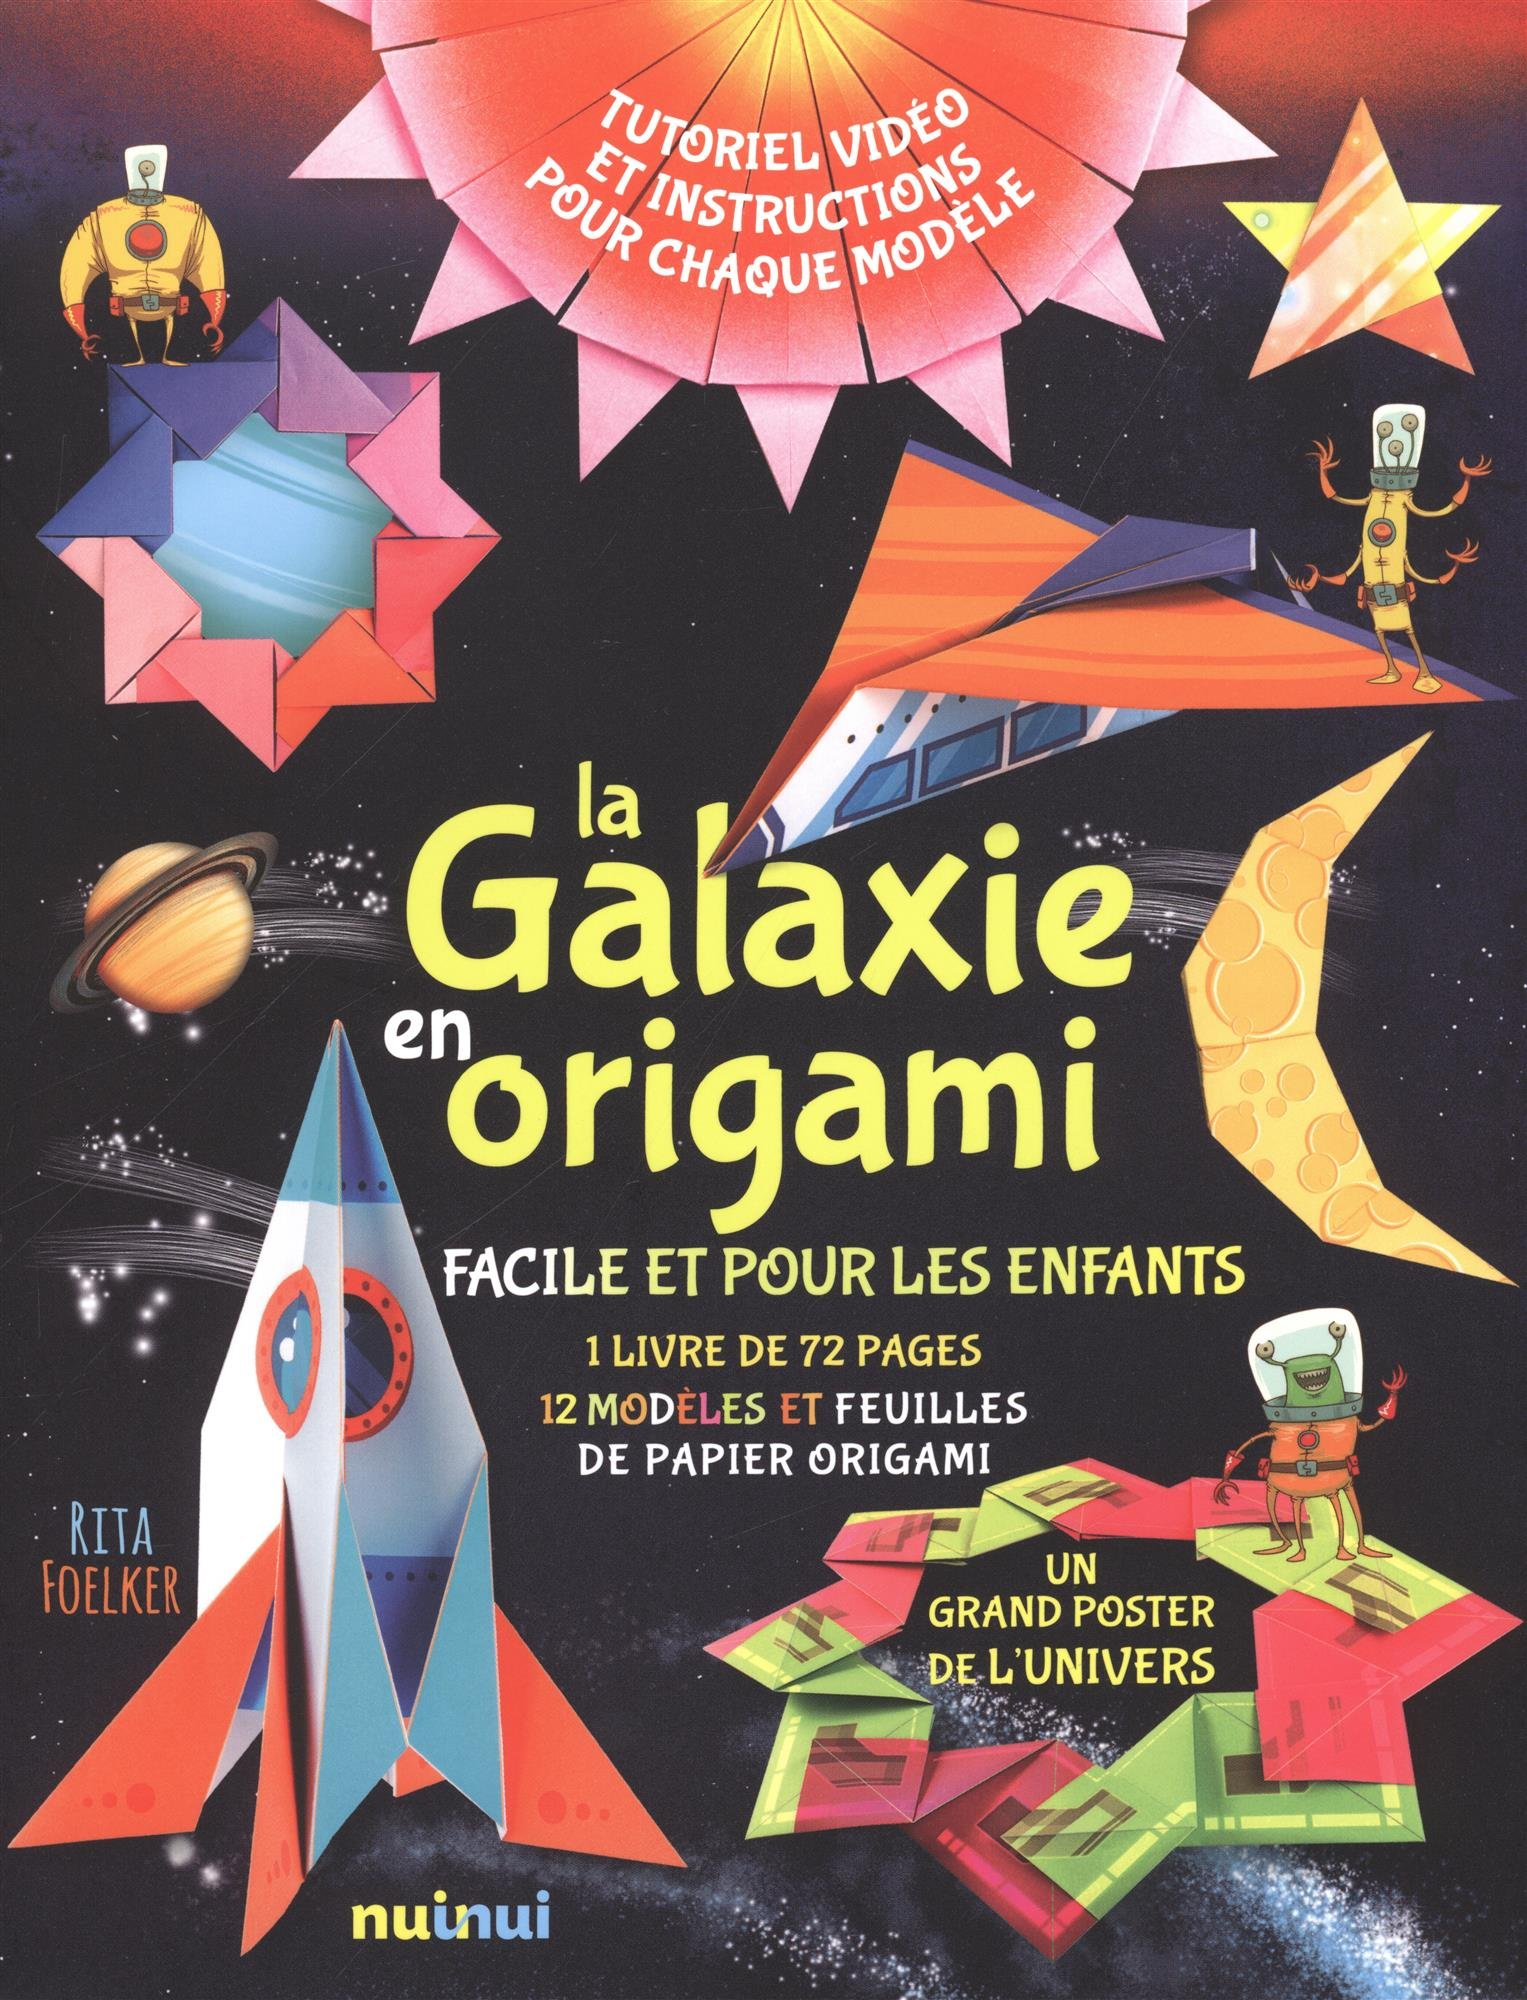 La galaxie en origami Boîte – 13 juillet 2017 Rita Foelker Nuinui 2889356183 Activités manuelles